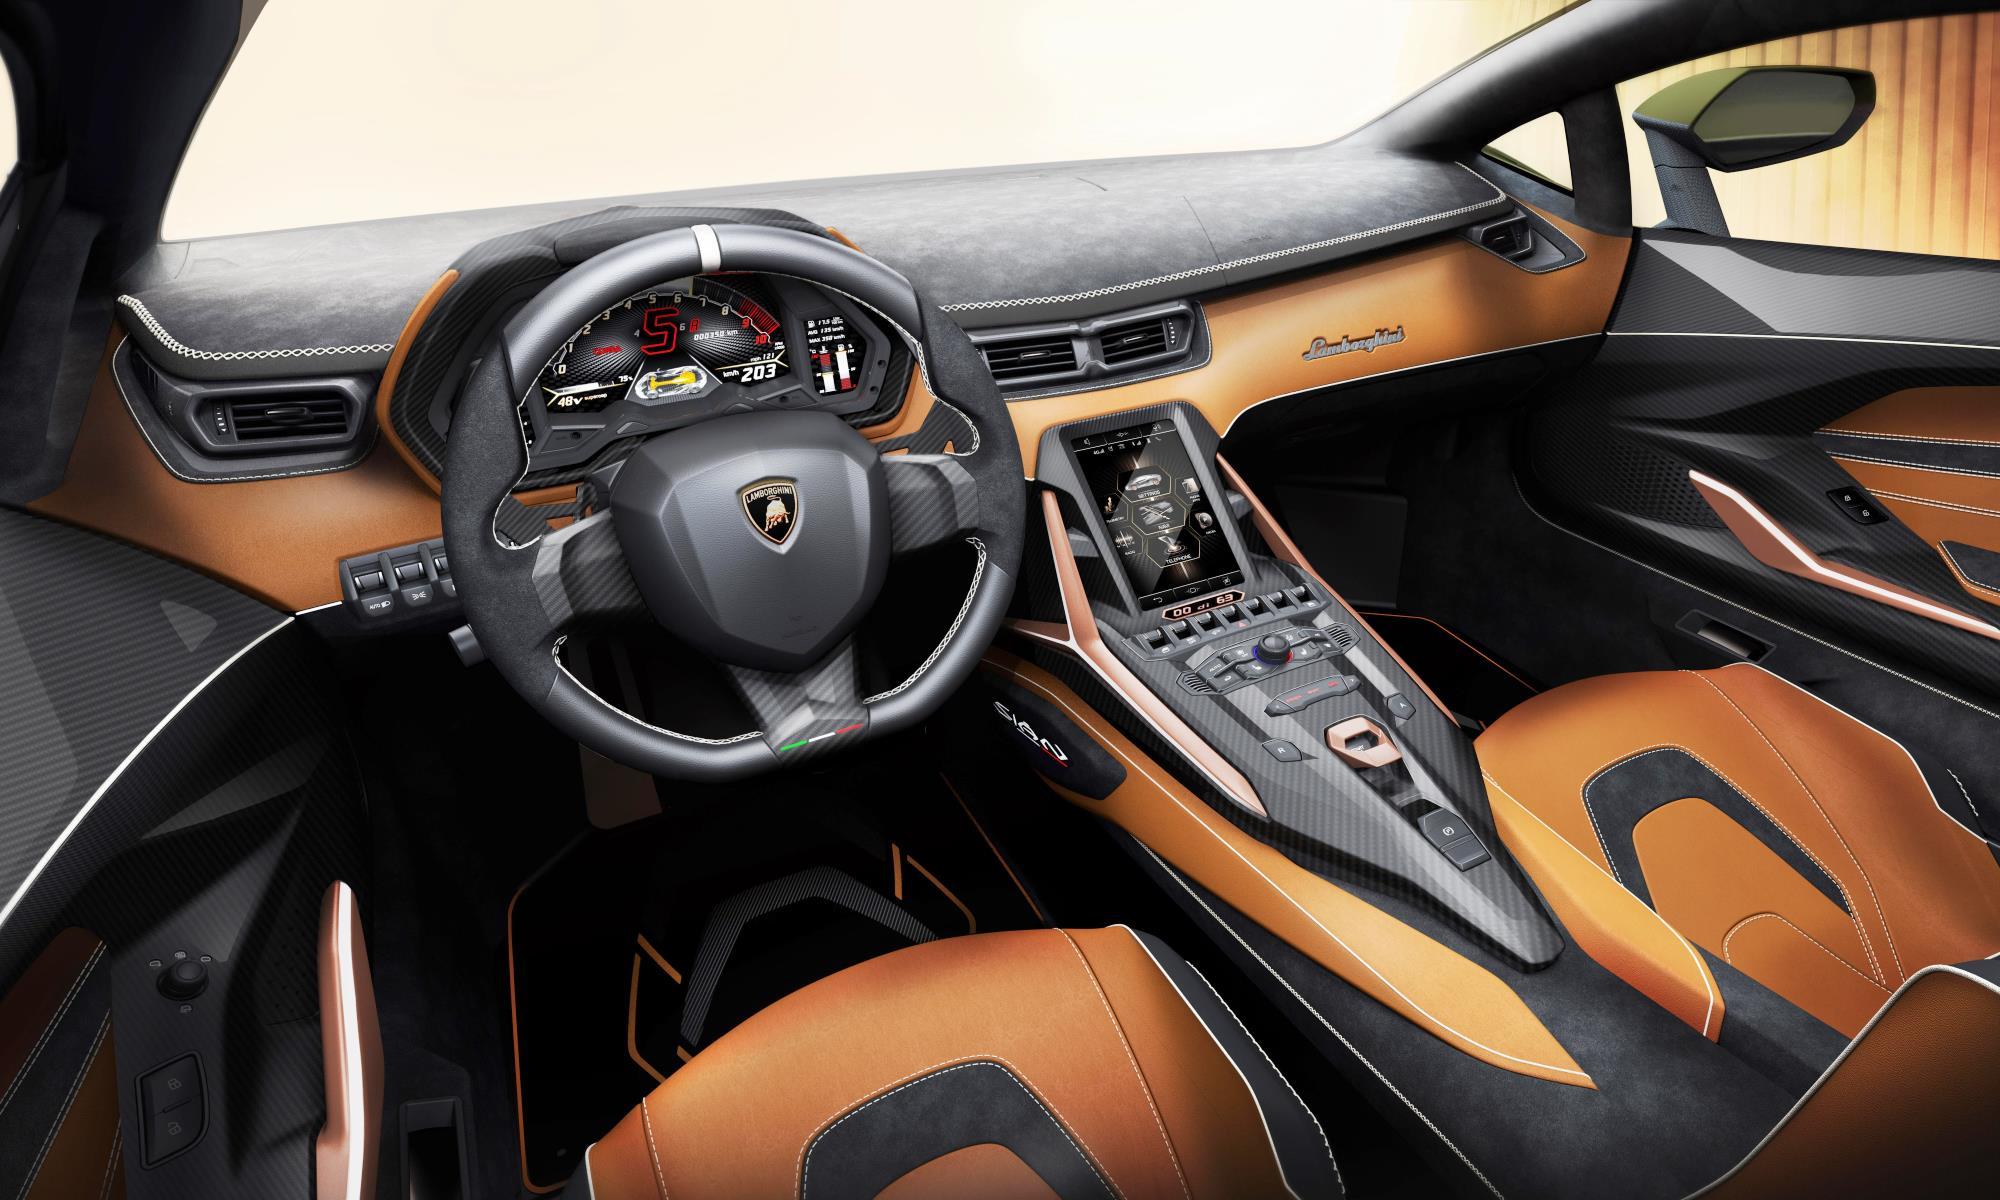 Lamborghini Sían FKP 37 interior